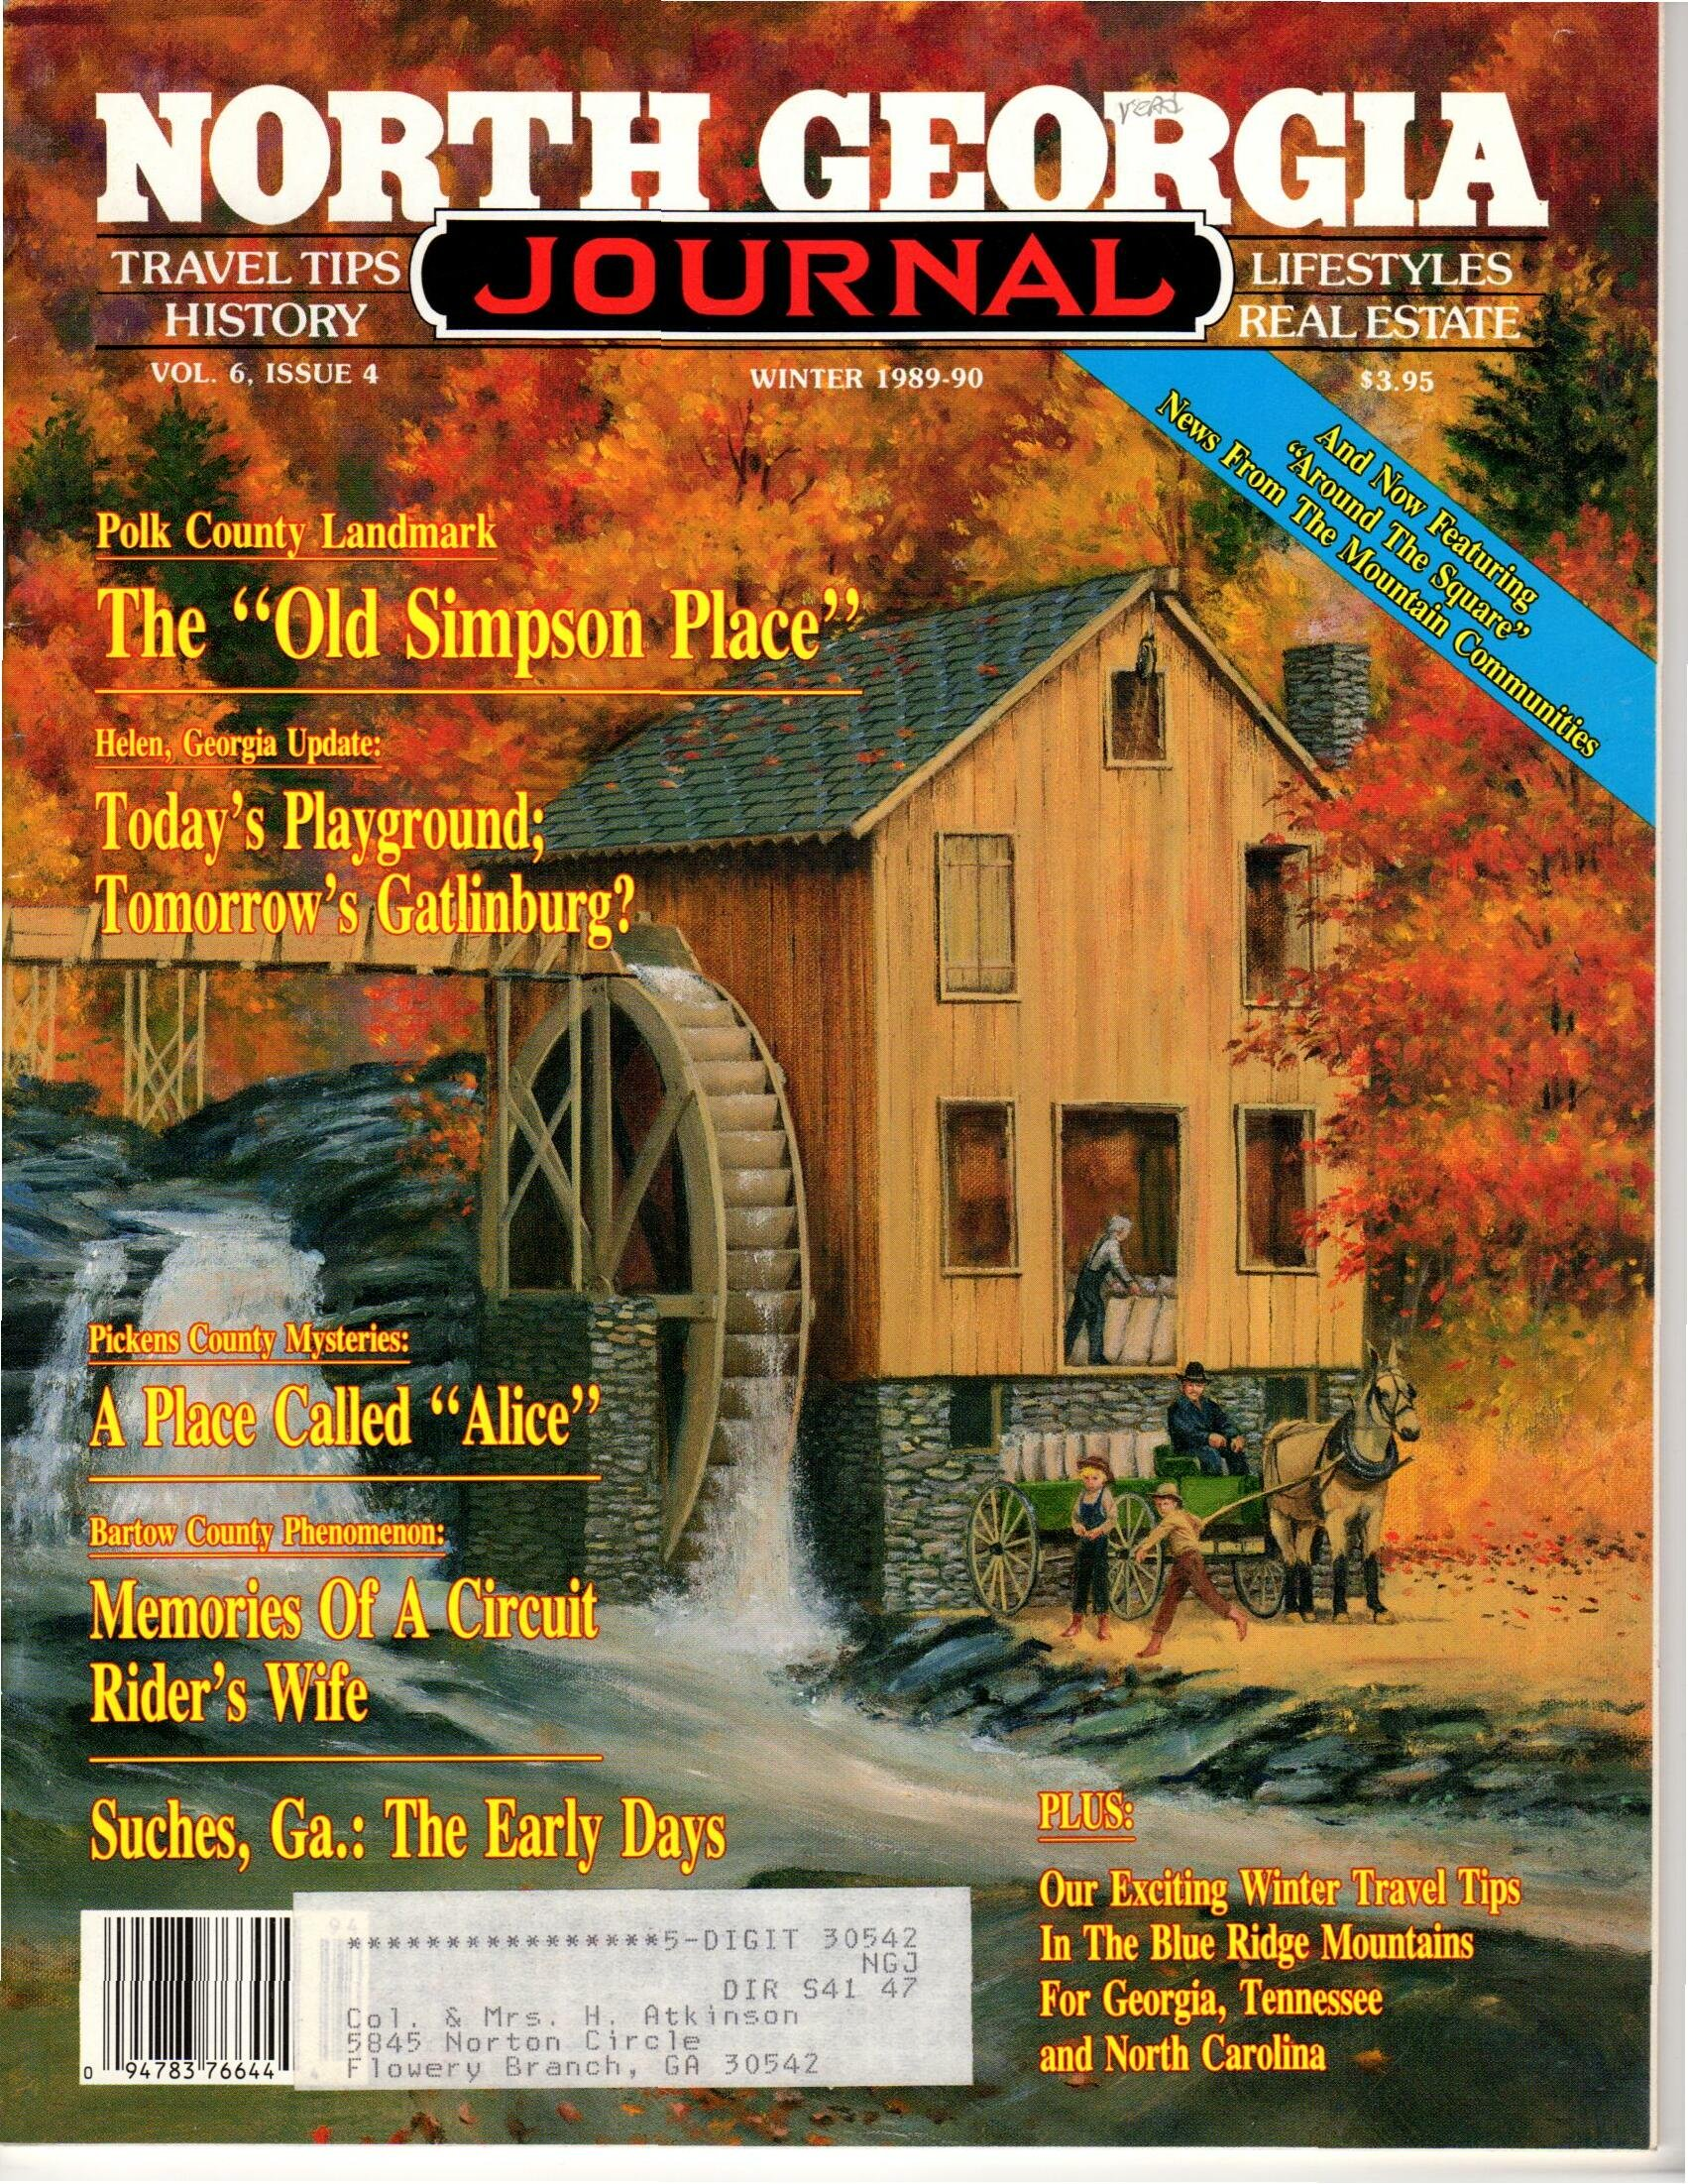 North Georgia Journal, Vol  6, No  4 - Winter 1989 - 1990